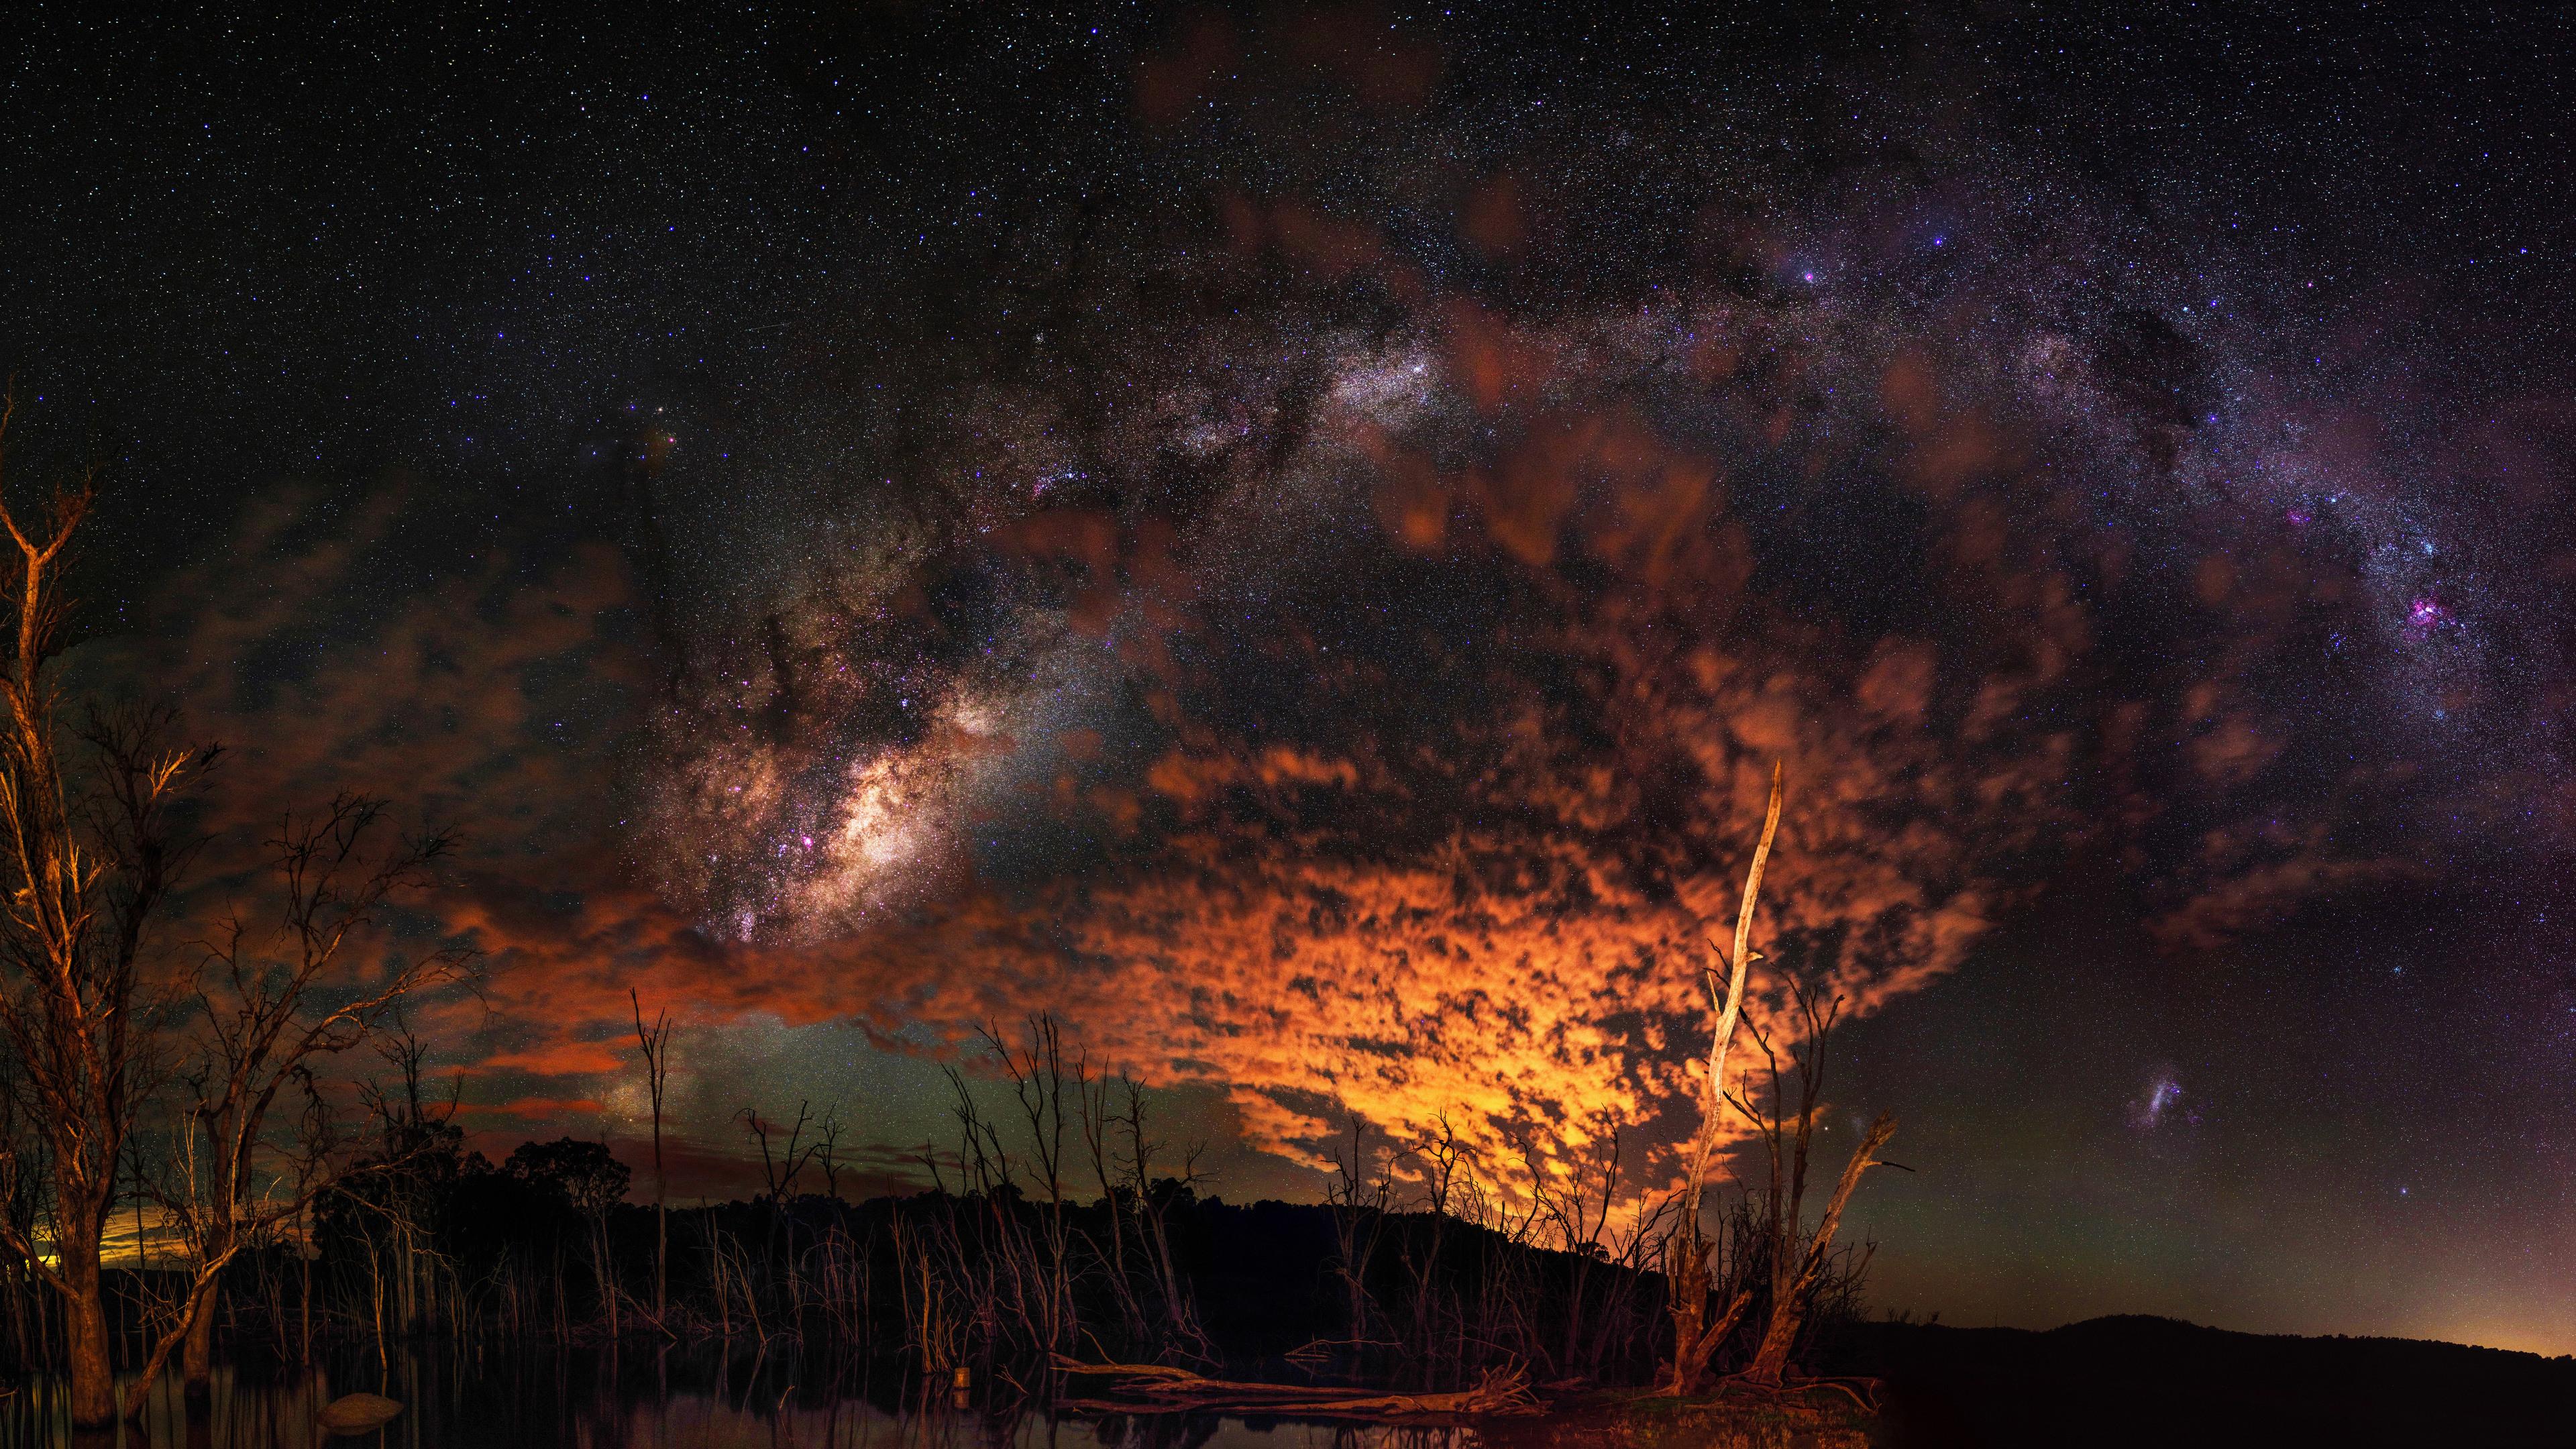 Milky Way 4k Stars Wallpapers Sky Wallpapers Scifi